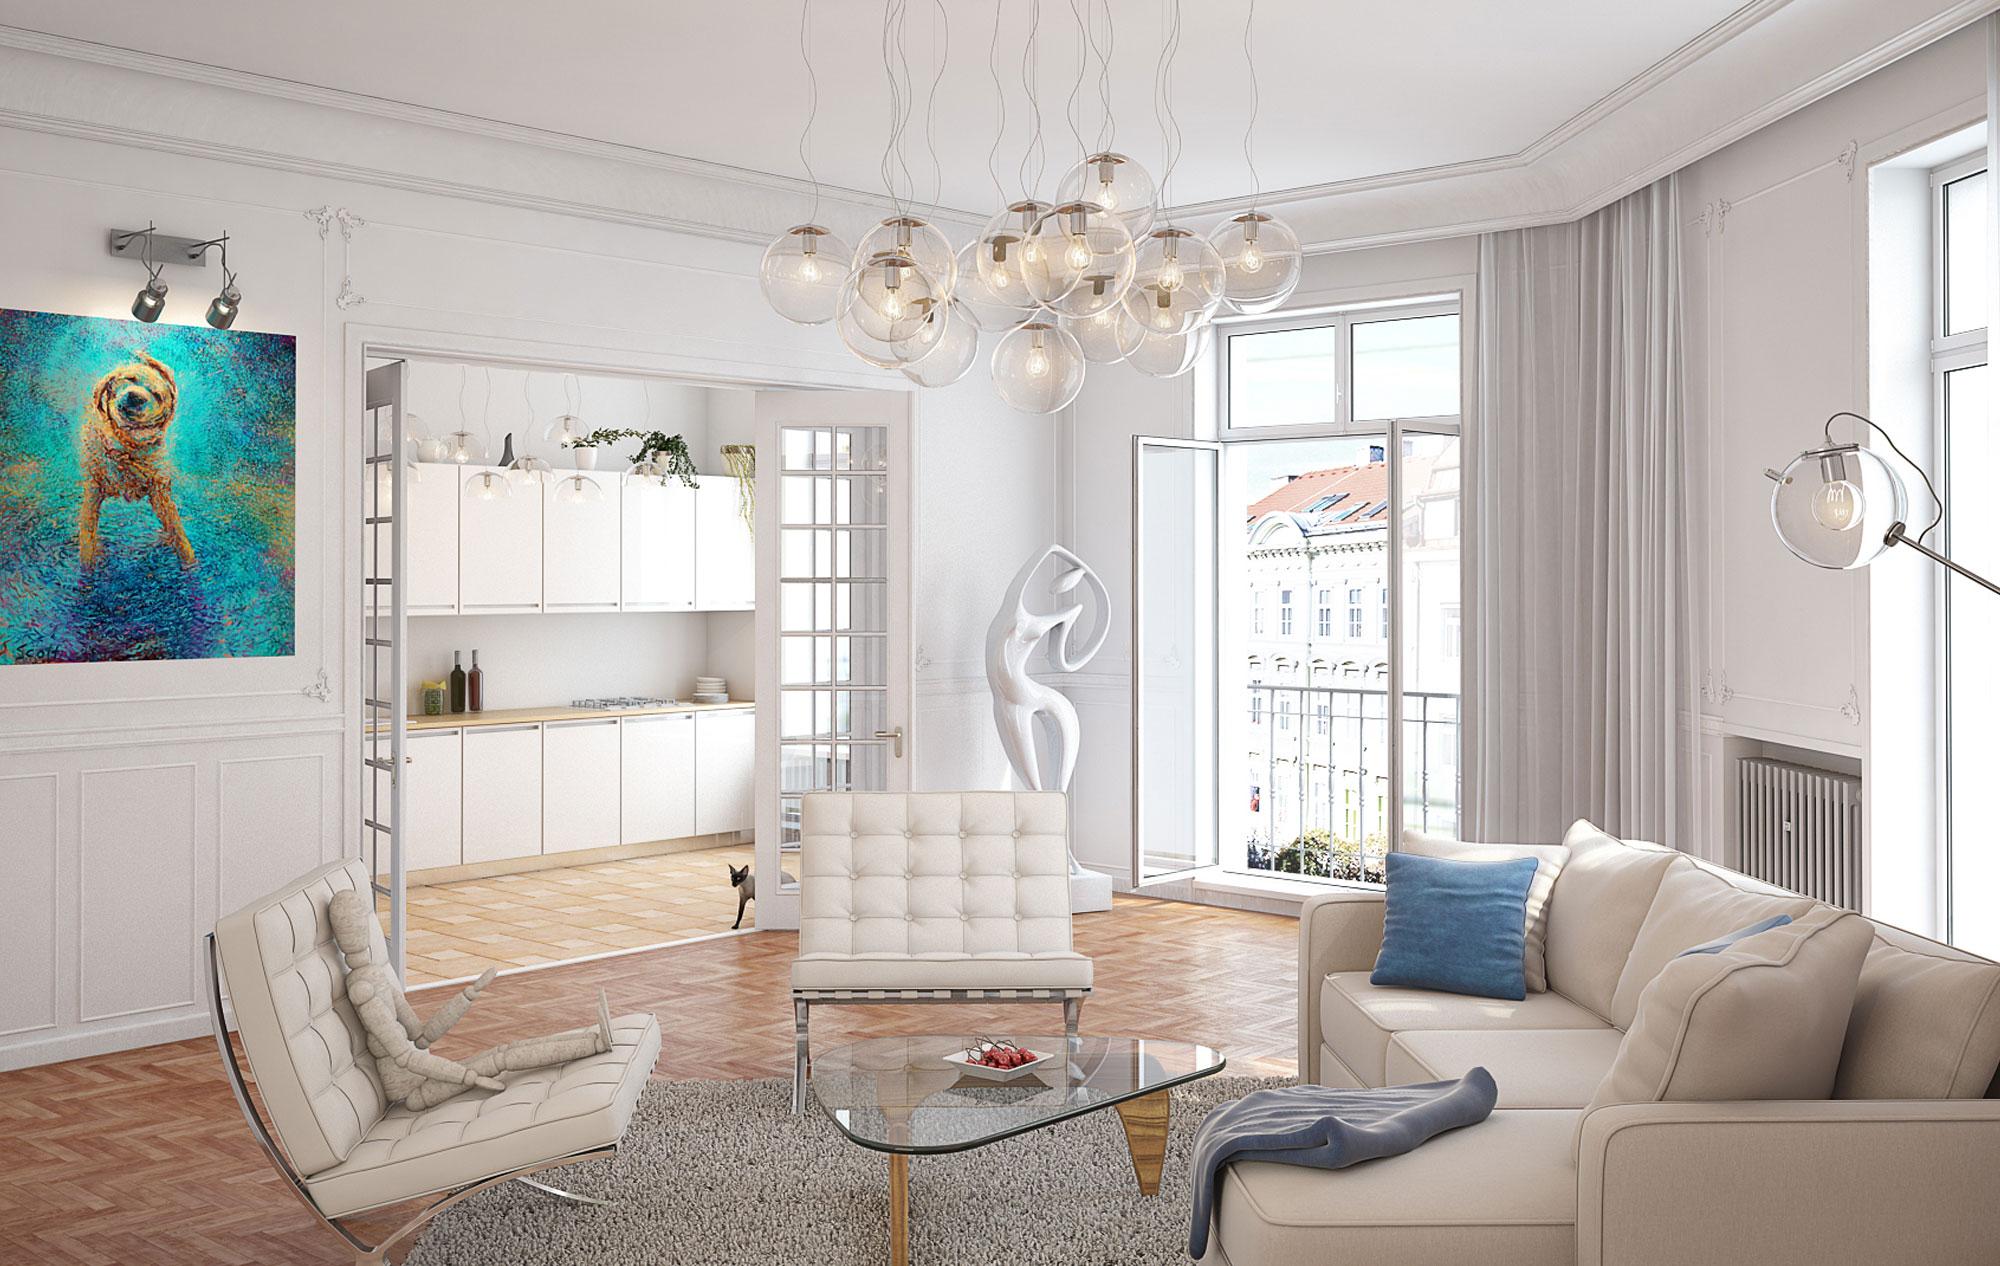 Design-Interior-Randari-3D-Vizualizari-Arhitecturale-Living-Micul-Paris-Renderthing